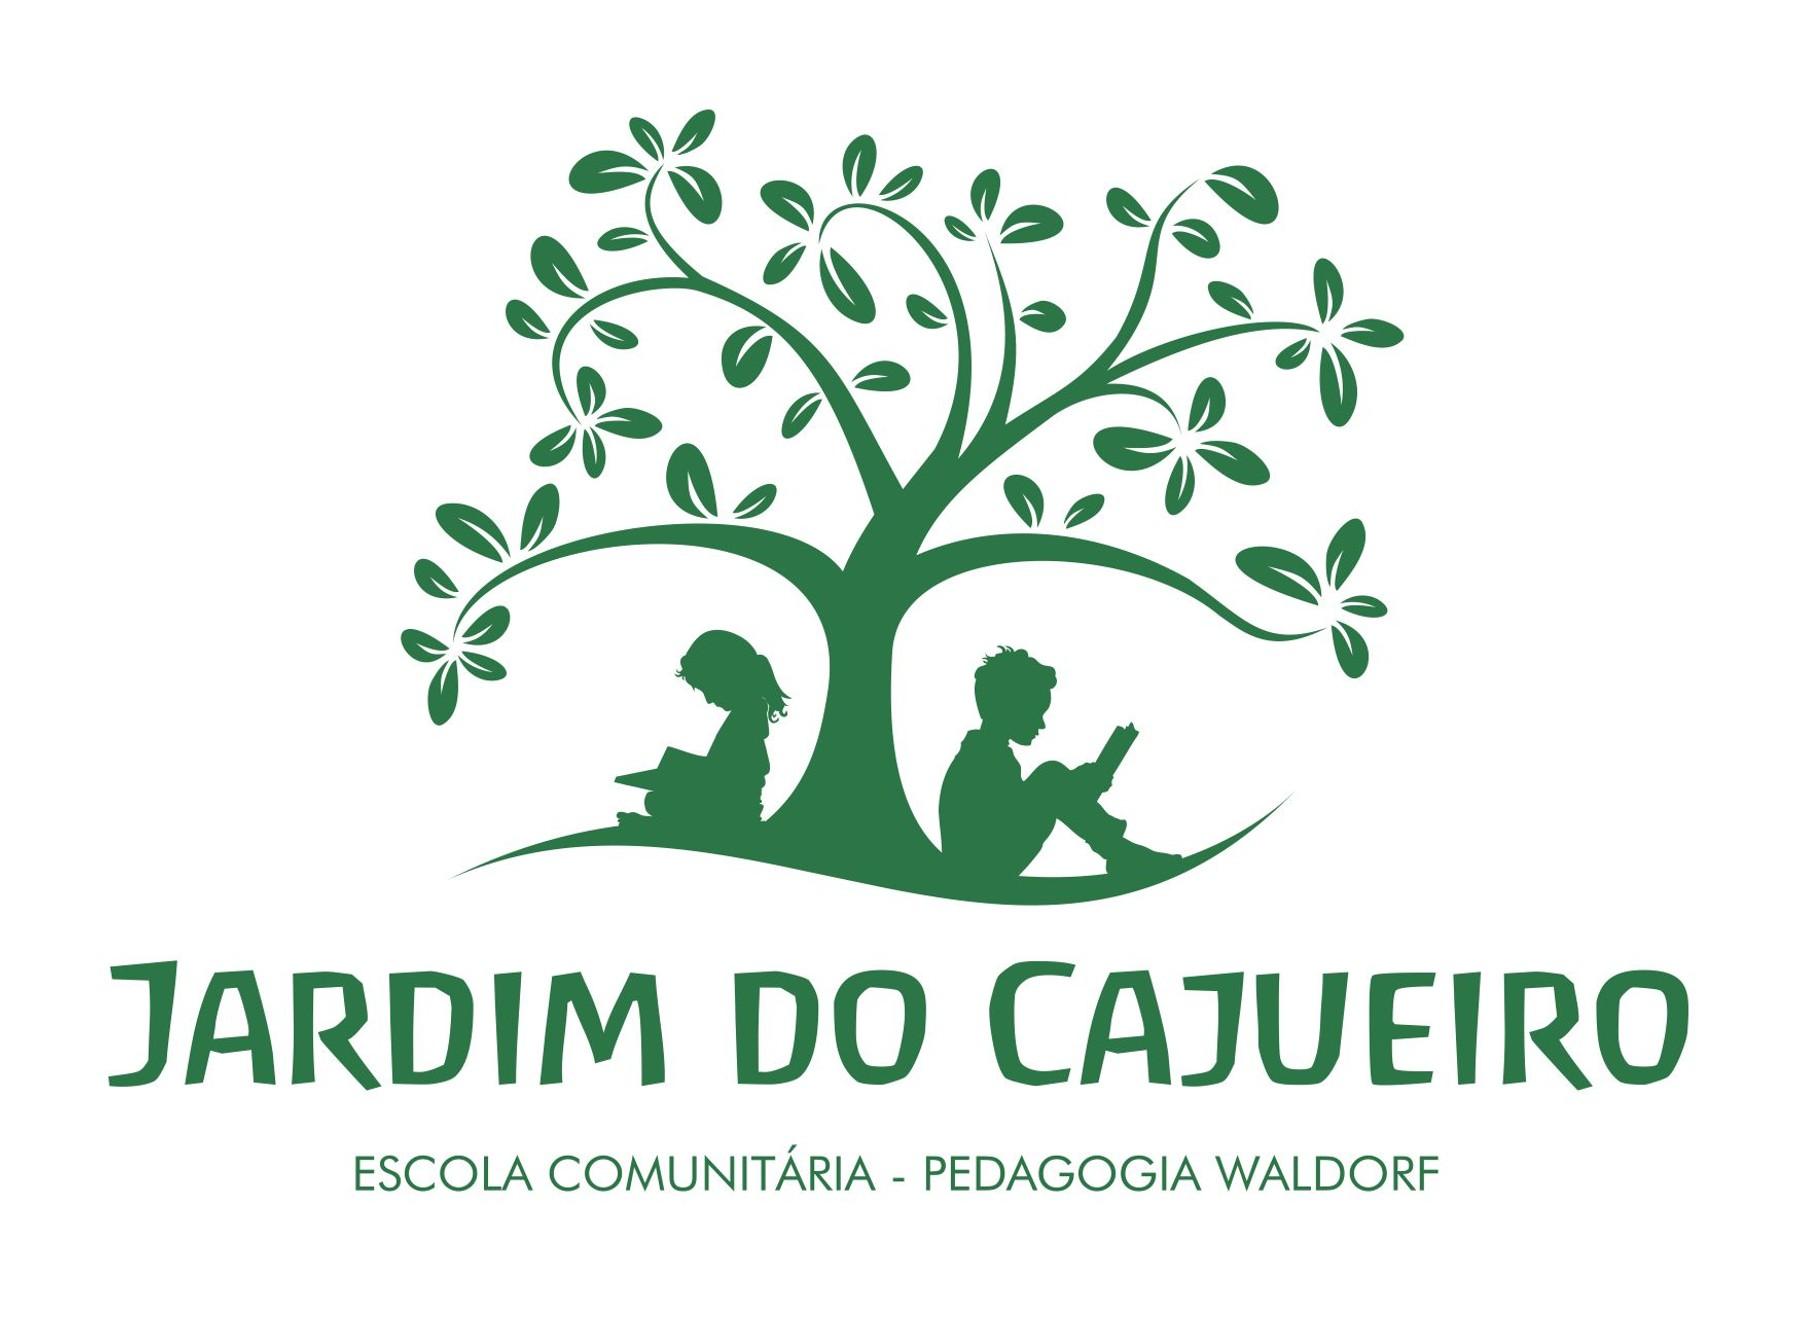 JD. CAJUEIRO